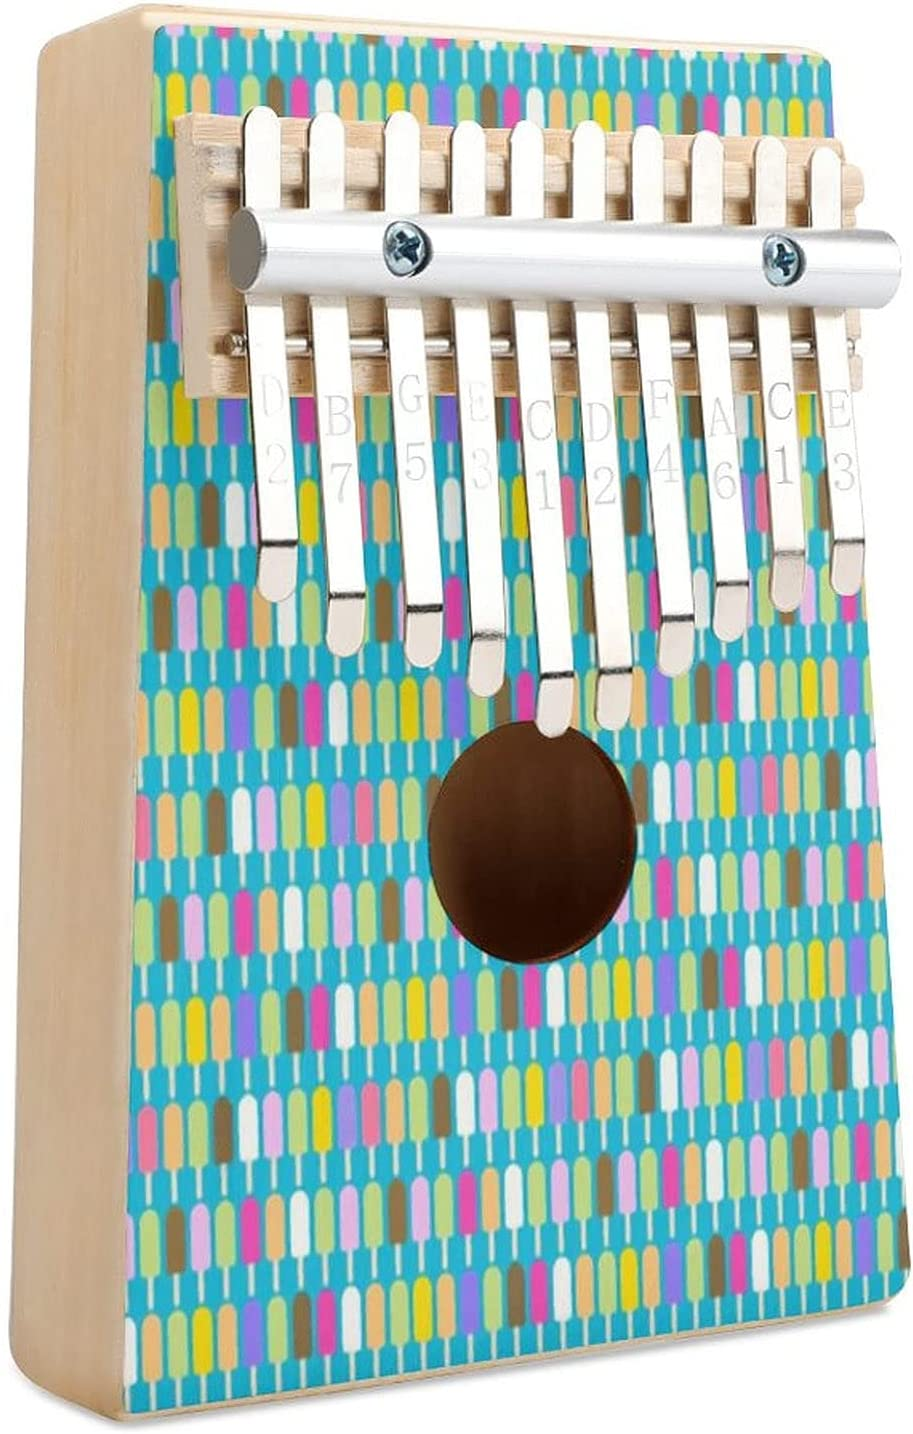 Very popular Pop Art Small New sales Popsicles Kalimba Thumb Piano 10 Finger Key